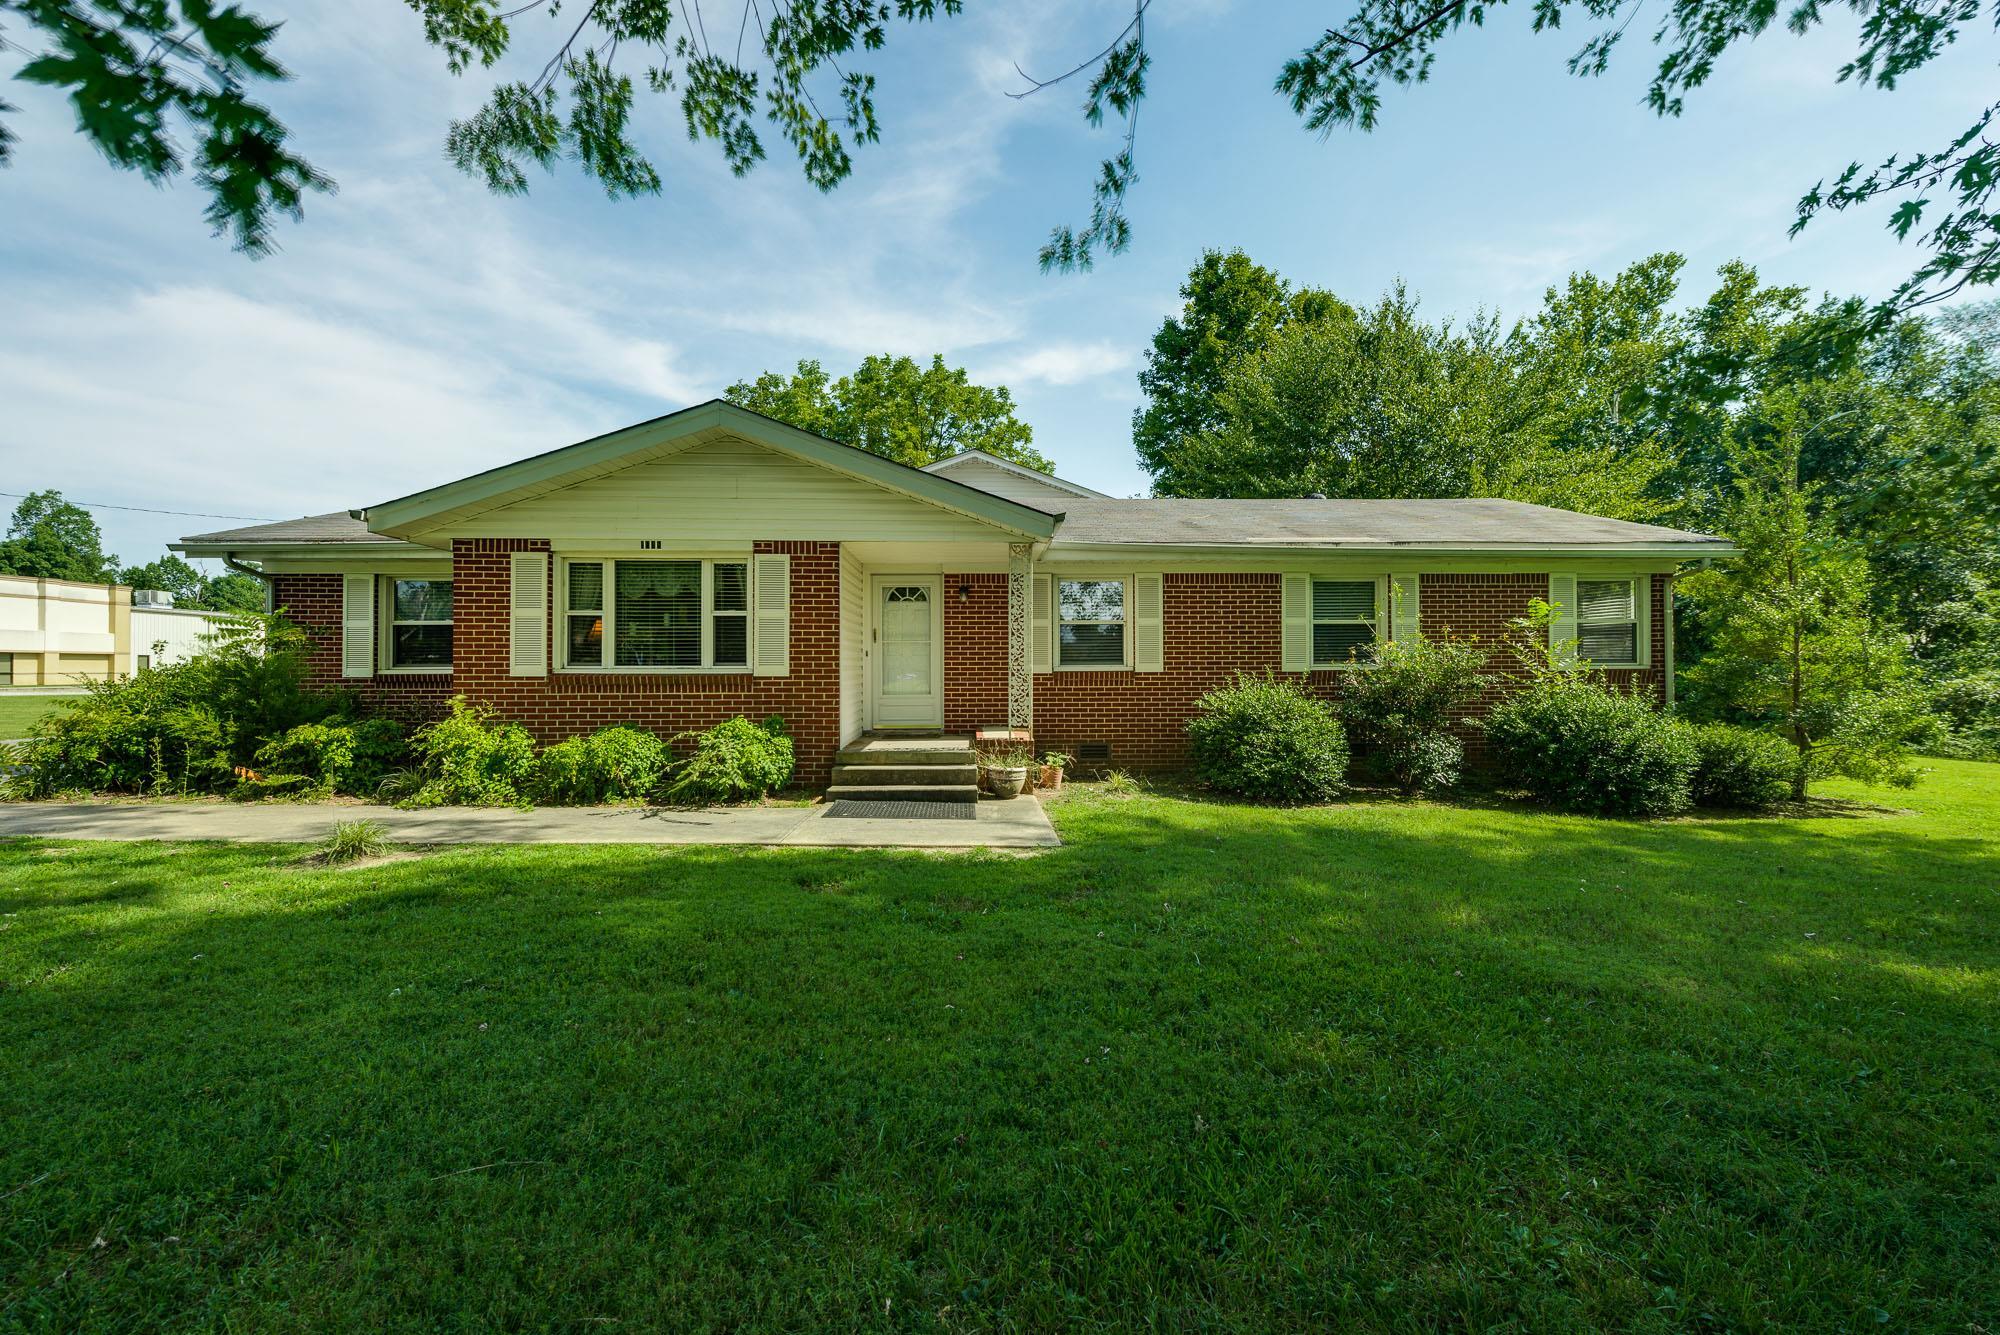 1648 Cookeville Hwy, Smithville, TN 37166 - Smithville, TN real estate listing